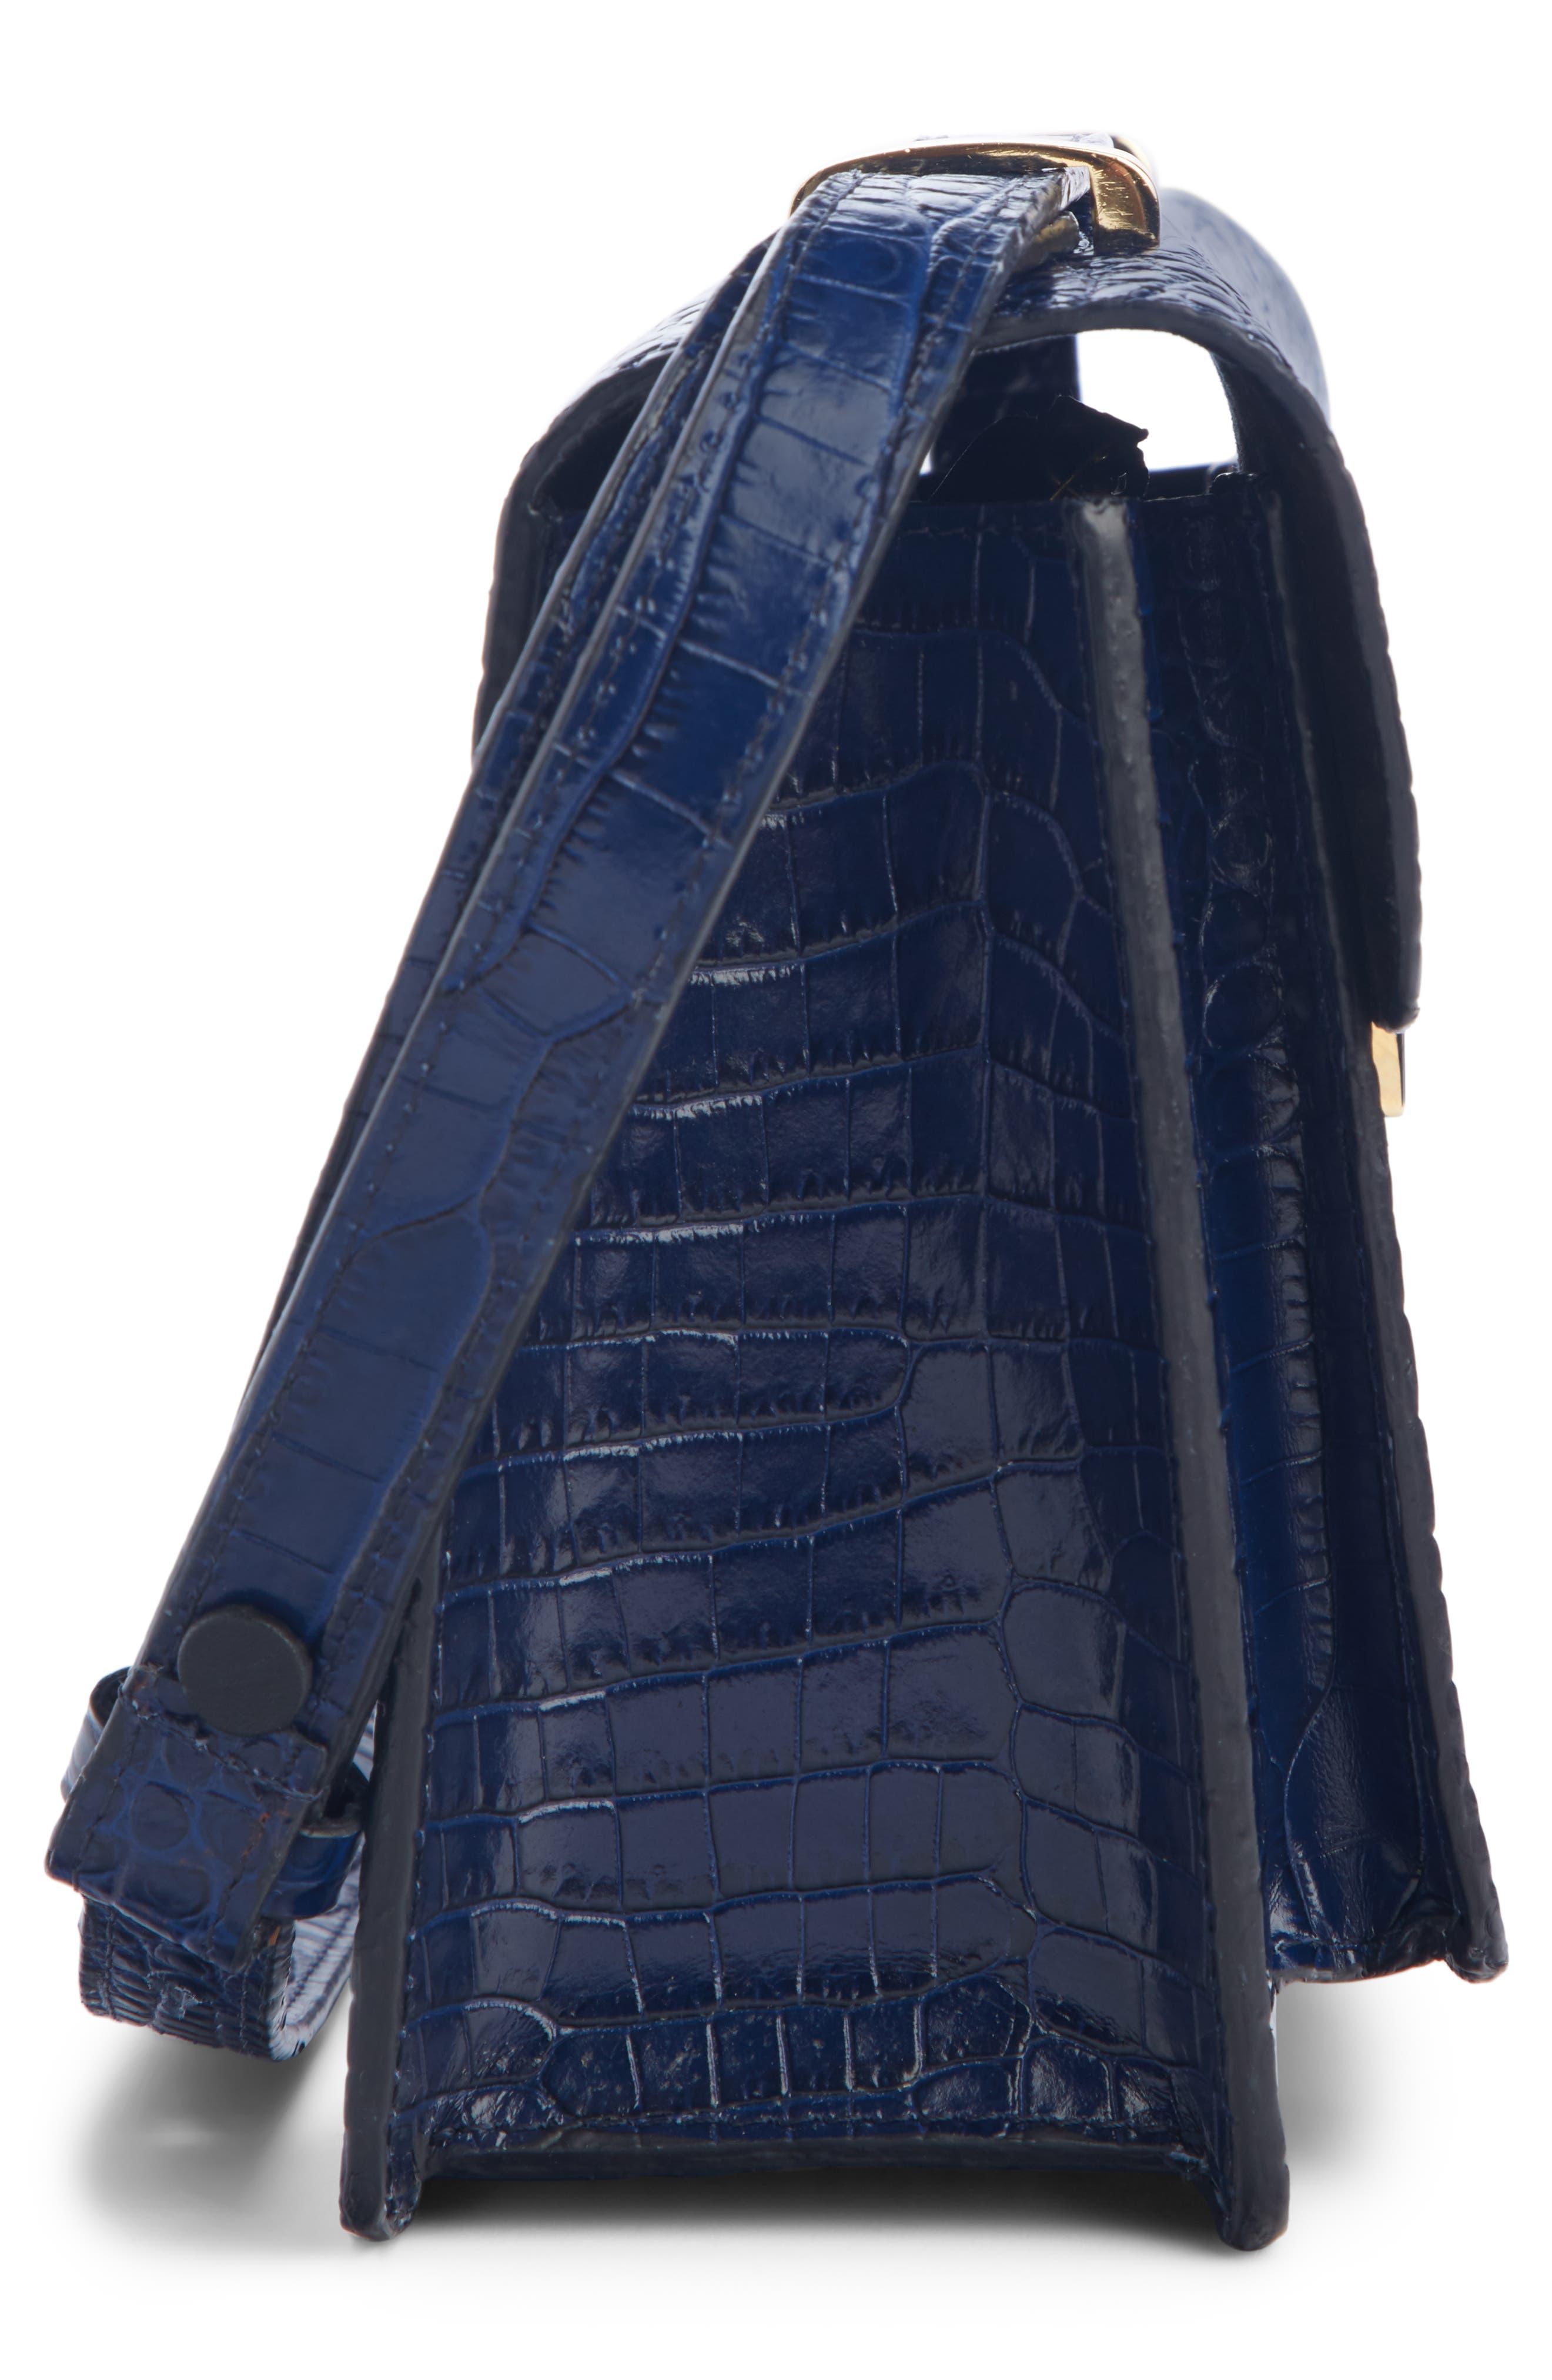 DRIES VAN NOTEN, Croc Embossed Leather Crossbody Bag, Alternate thumbnail 3, color, BLUE